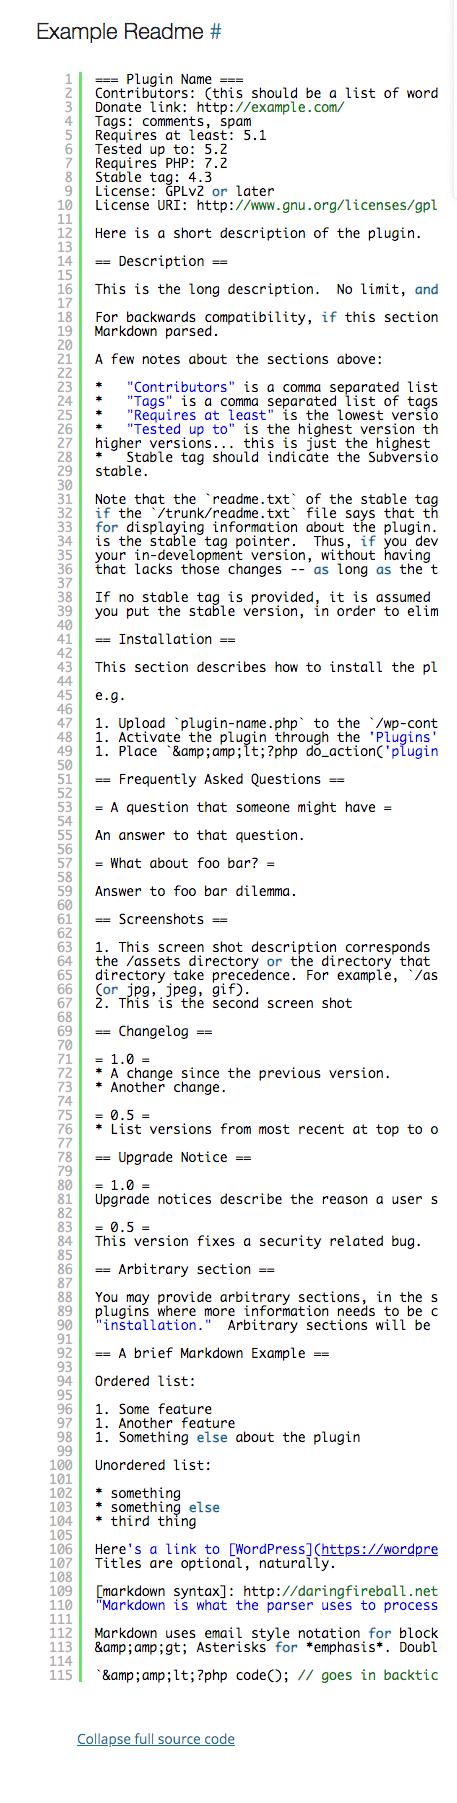 Example of readme file — wordpress.org